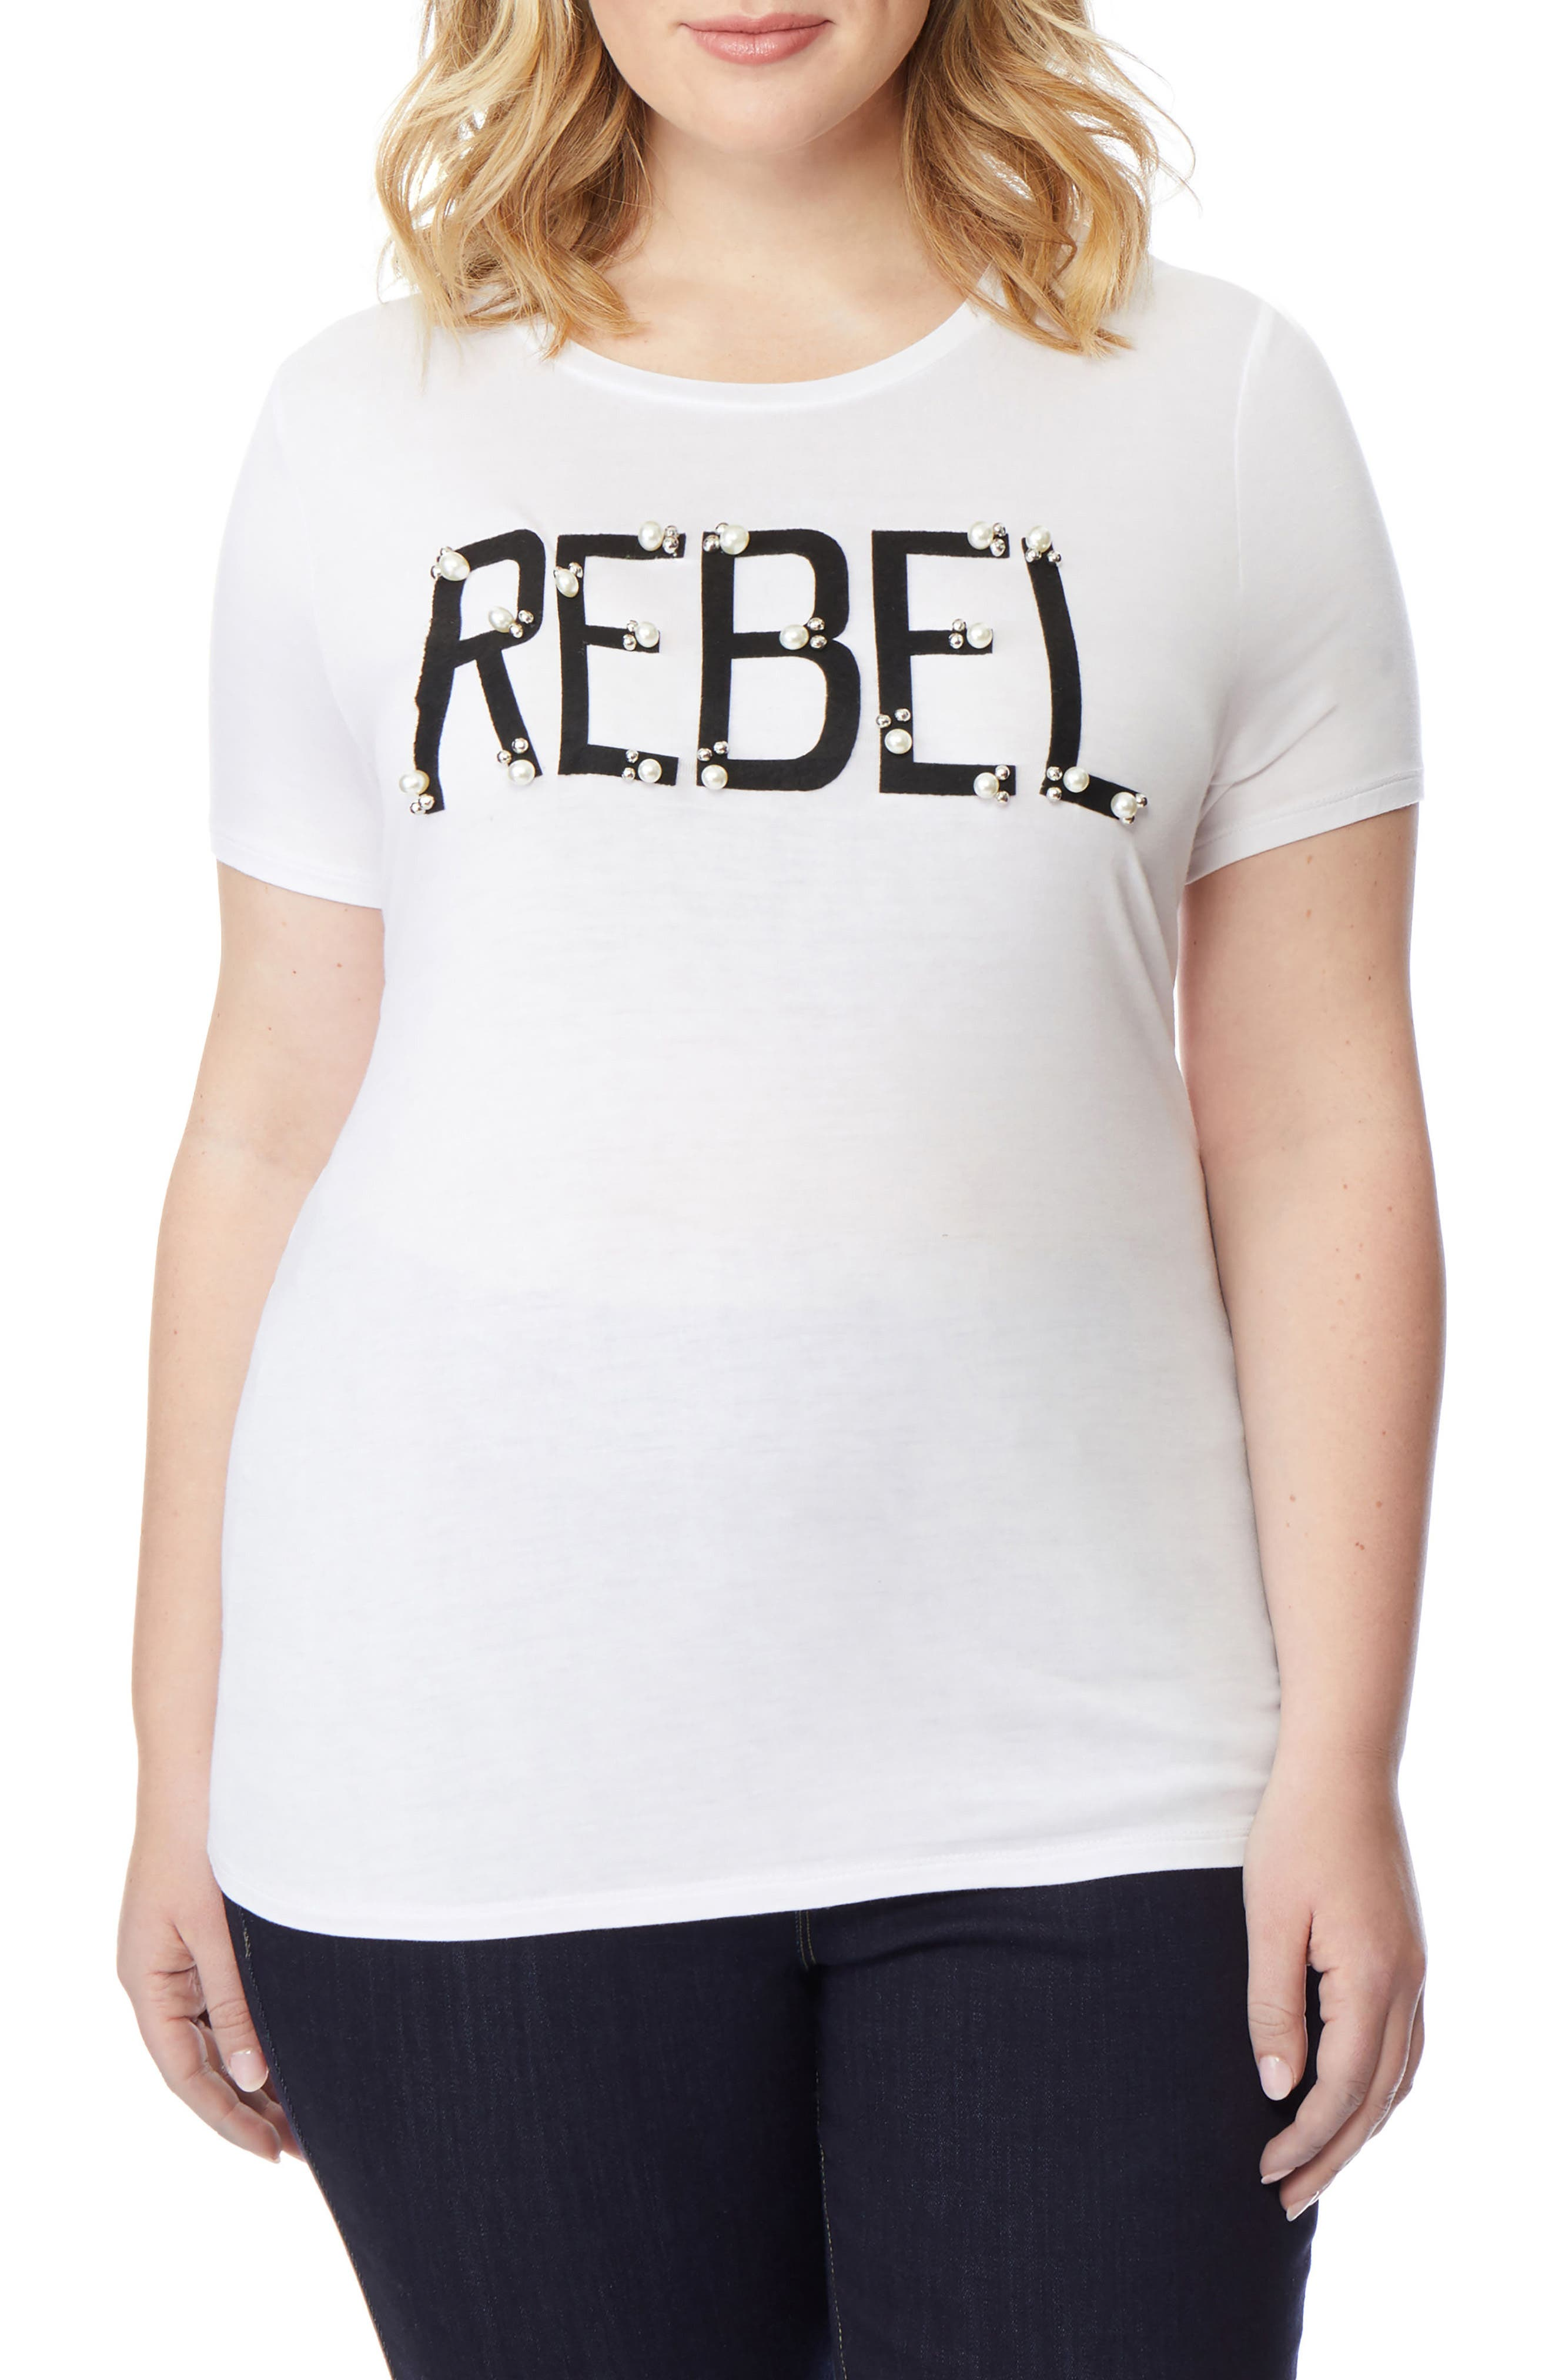 REBEL WILSON X ANGELS, Rebel Embellished Graphic Tee, Main thumbnail 1, color, 107